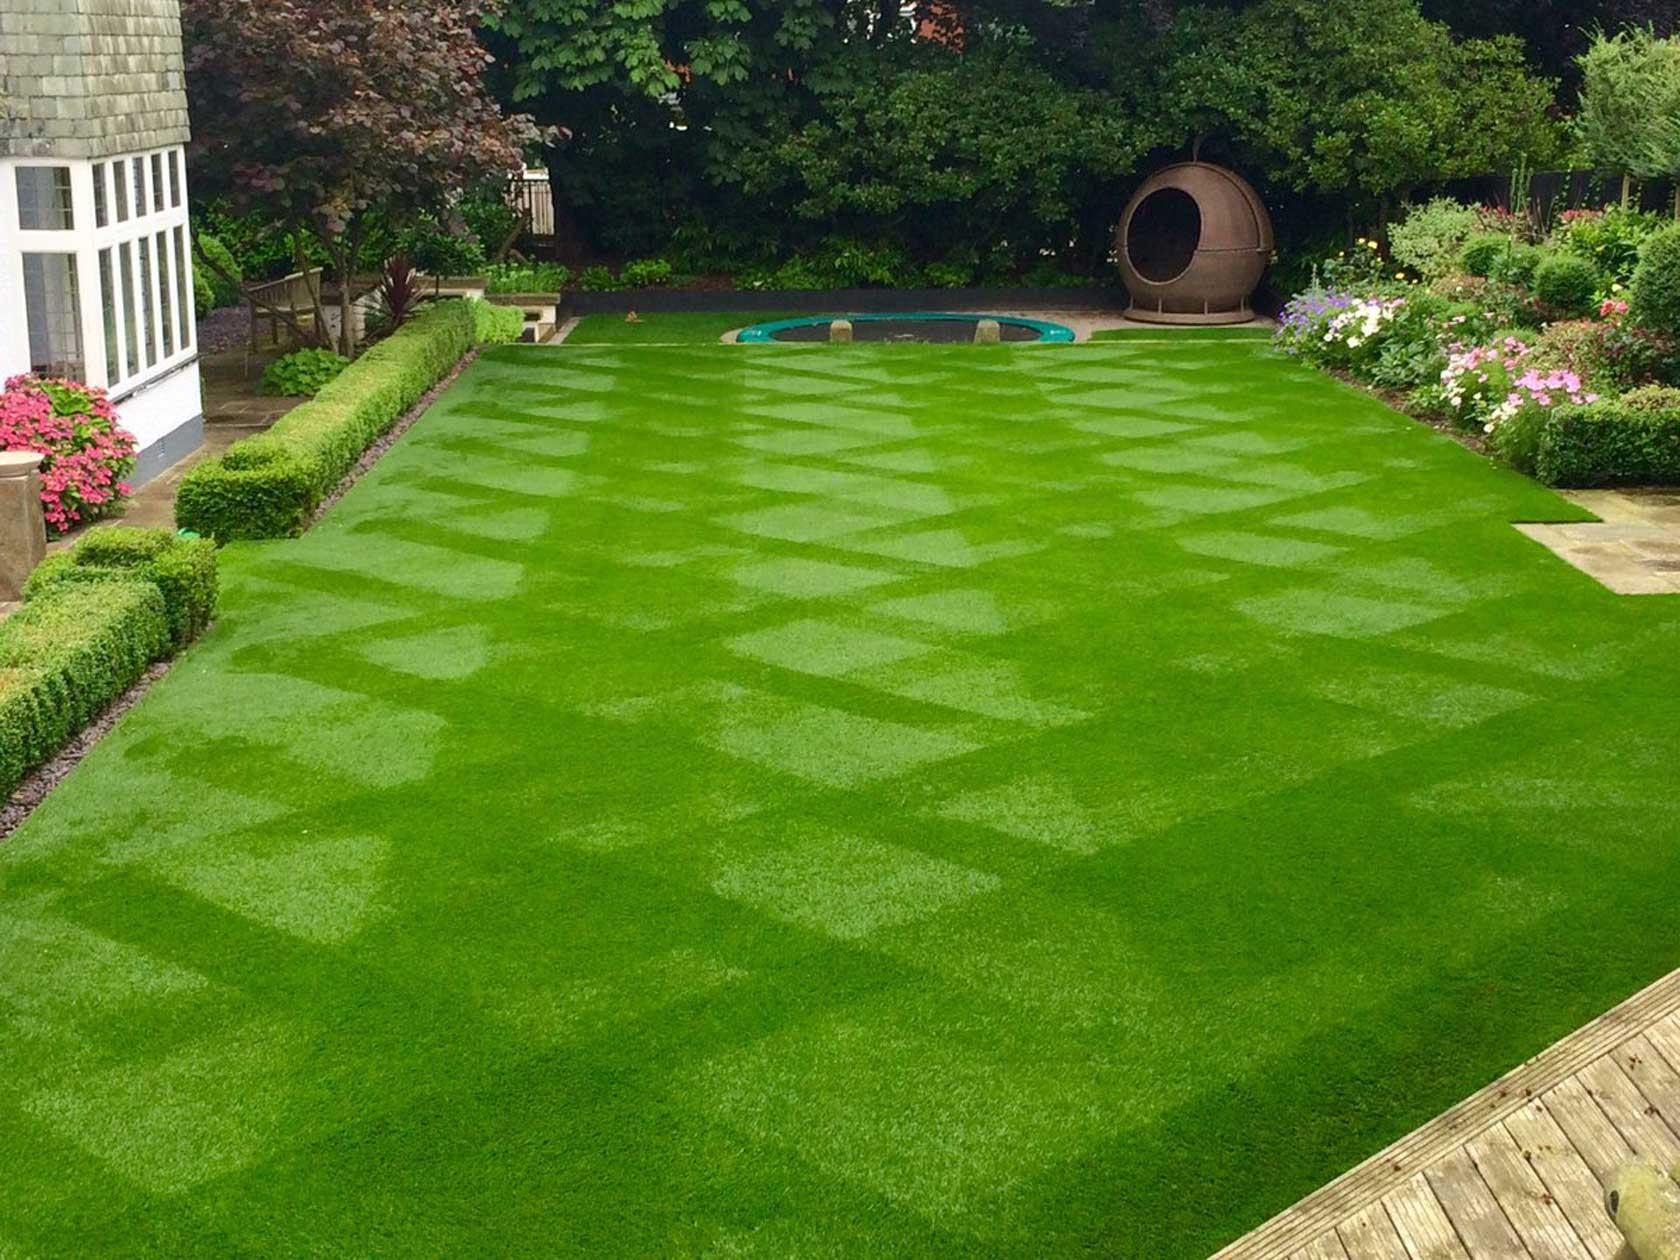 Having The Best Lawn